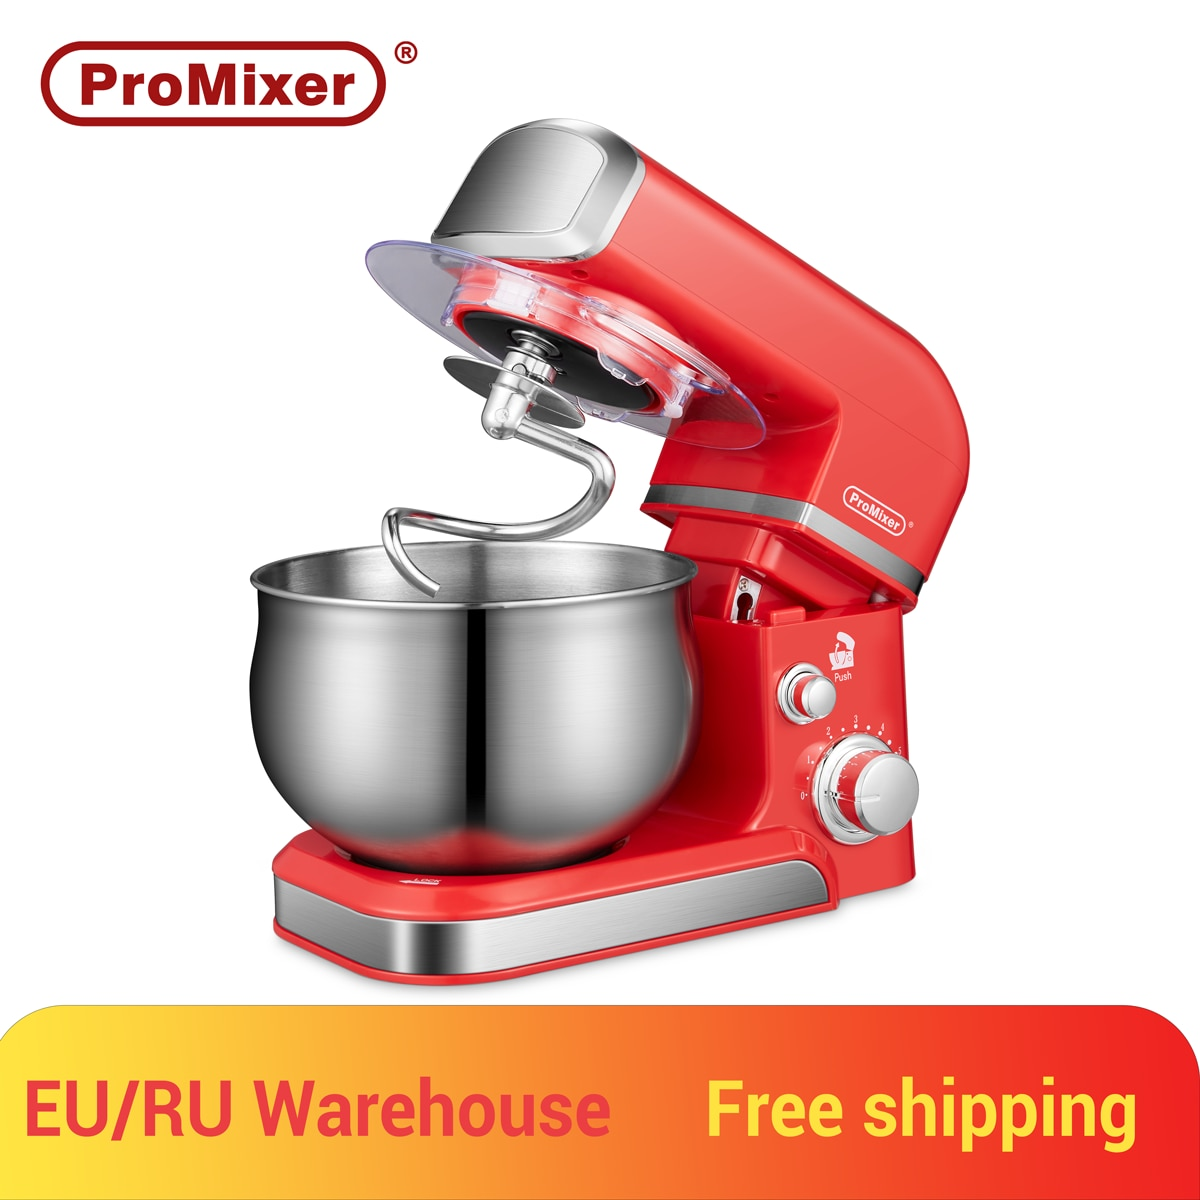 ProMixer,Q4,Stand Mixer,Kitchen-Robot,Kneading/Mixing-Machine,Blender,4L,700W,6speed,INOX,Stainless Steel,Bowl,Cream,Egg,Cake